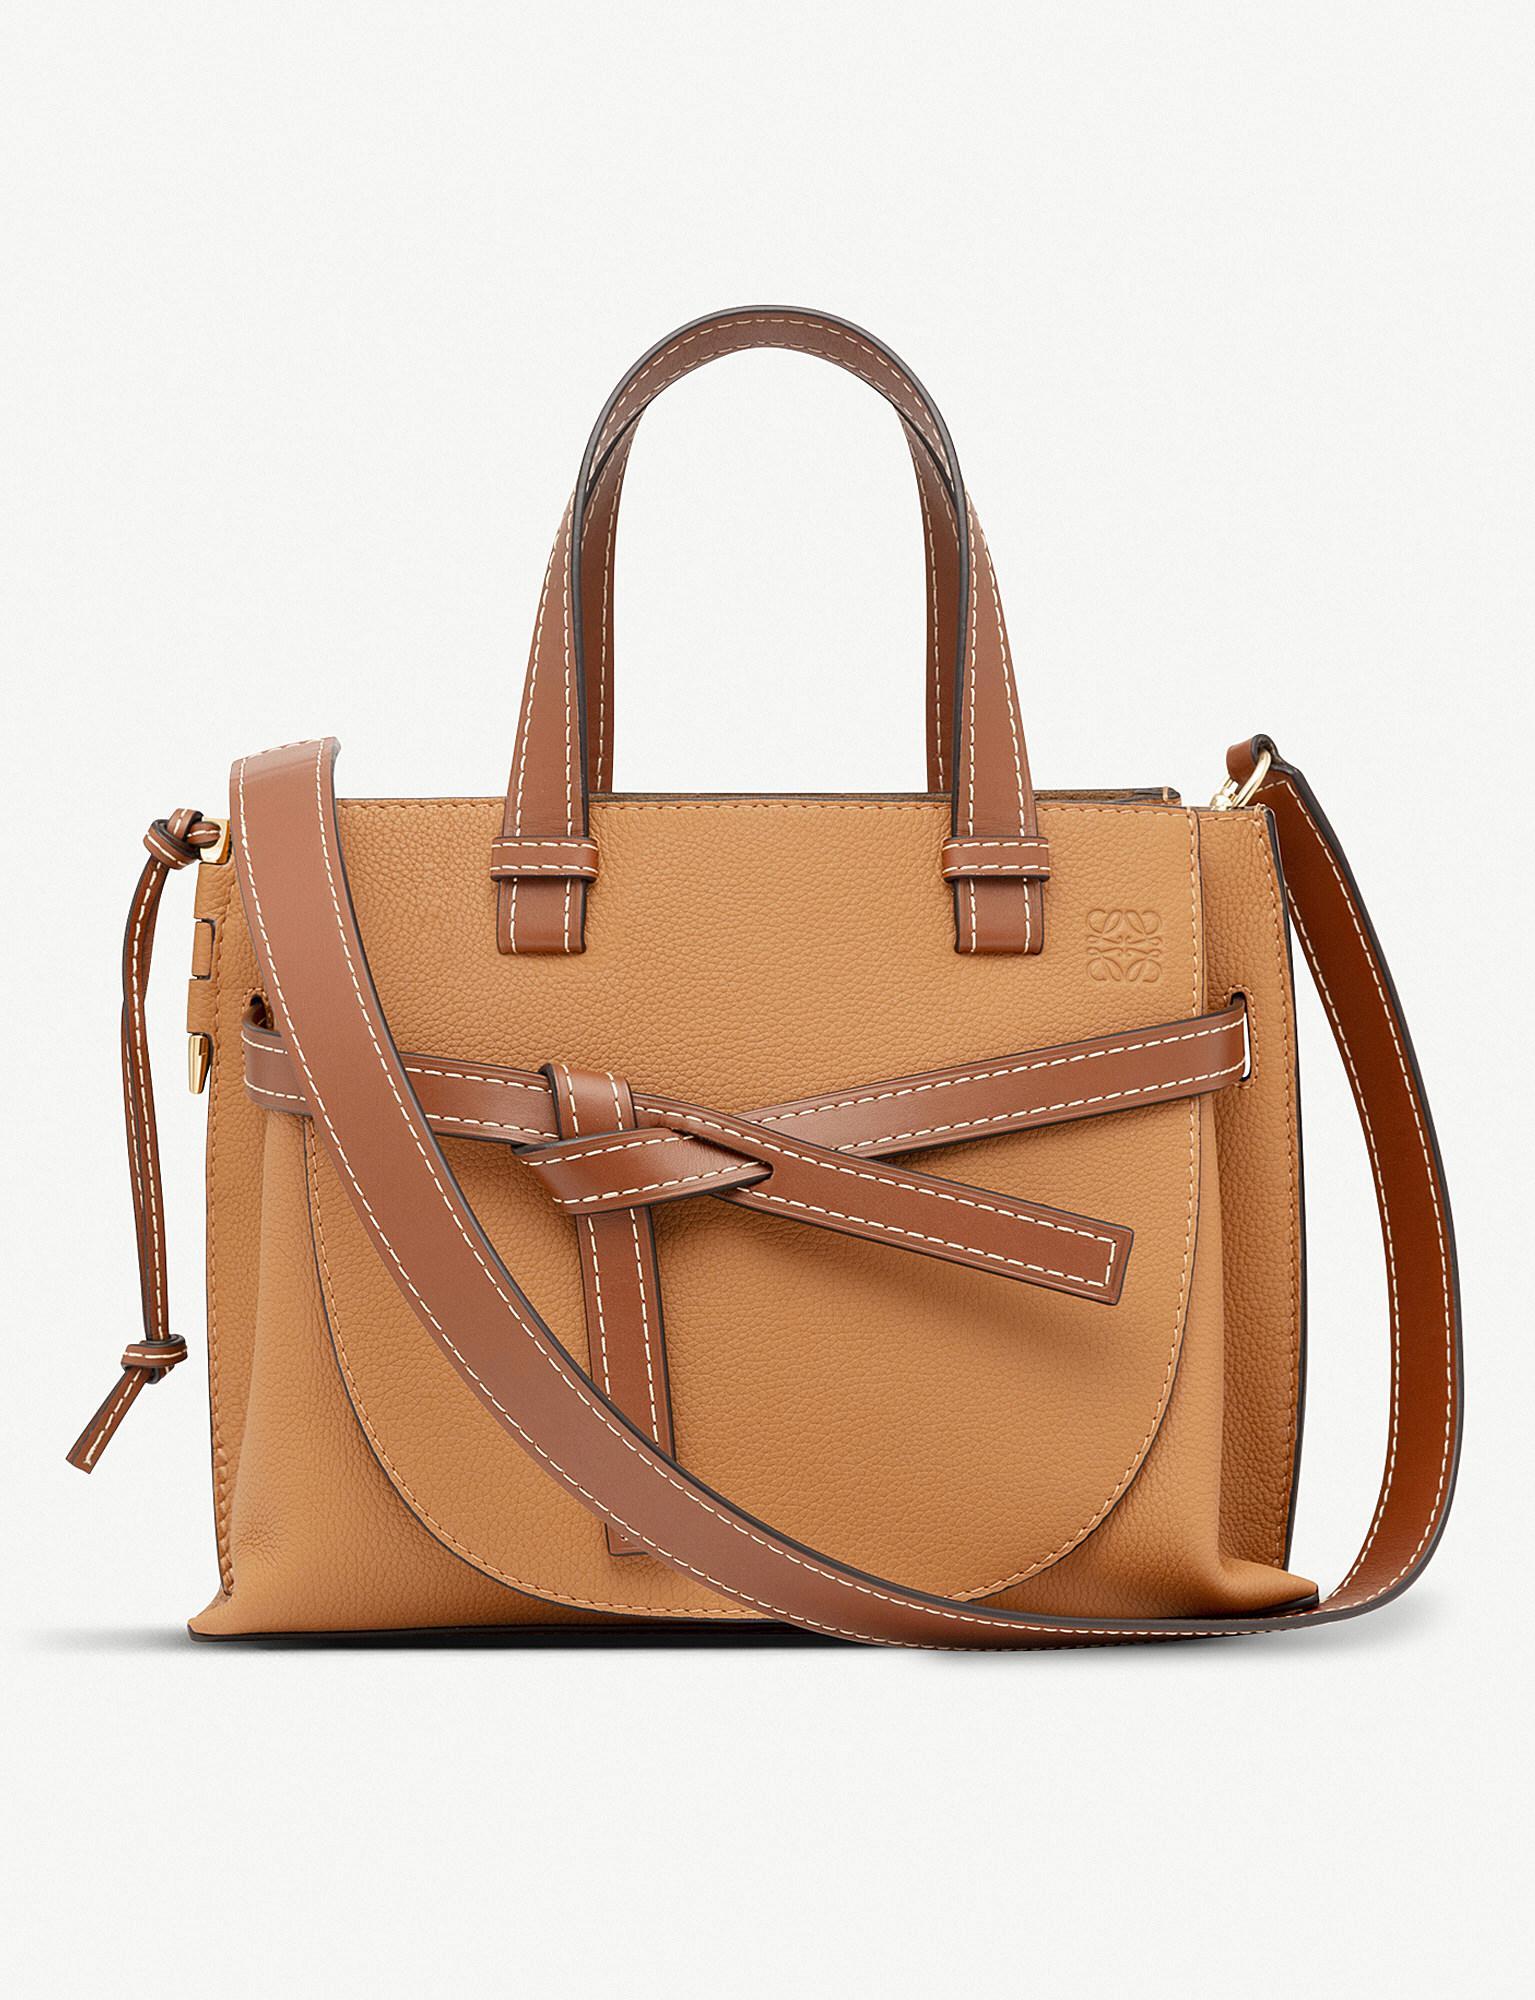 277cbd1c87 Loewe Gate Top-handle Small Leather Tote Bag in Brown - Lyst